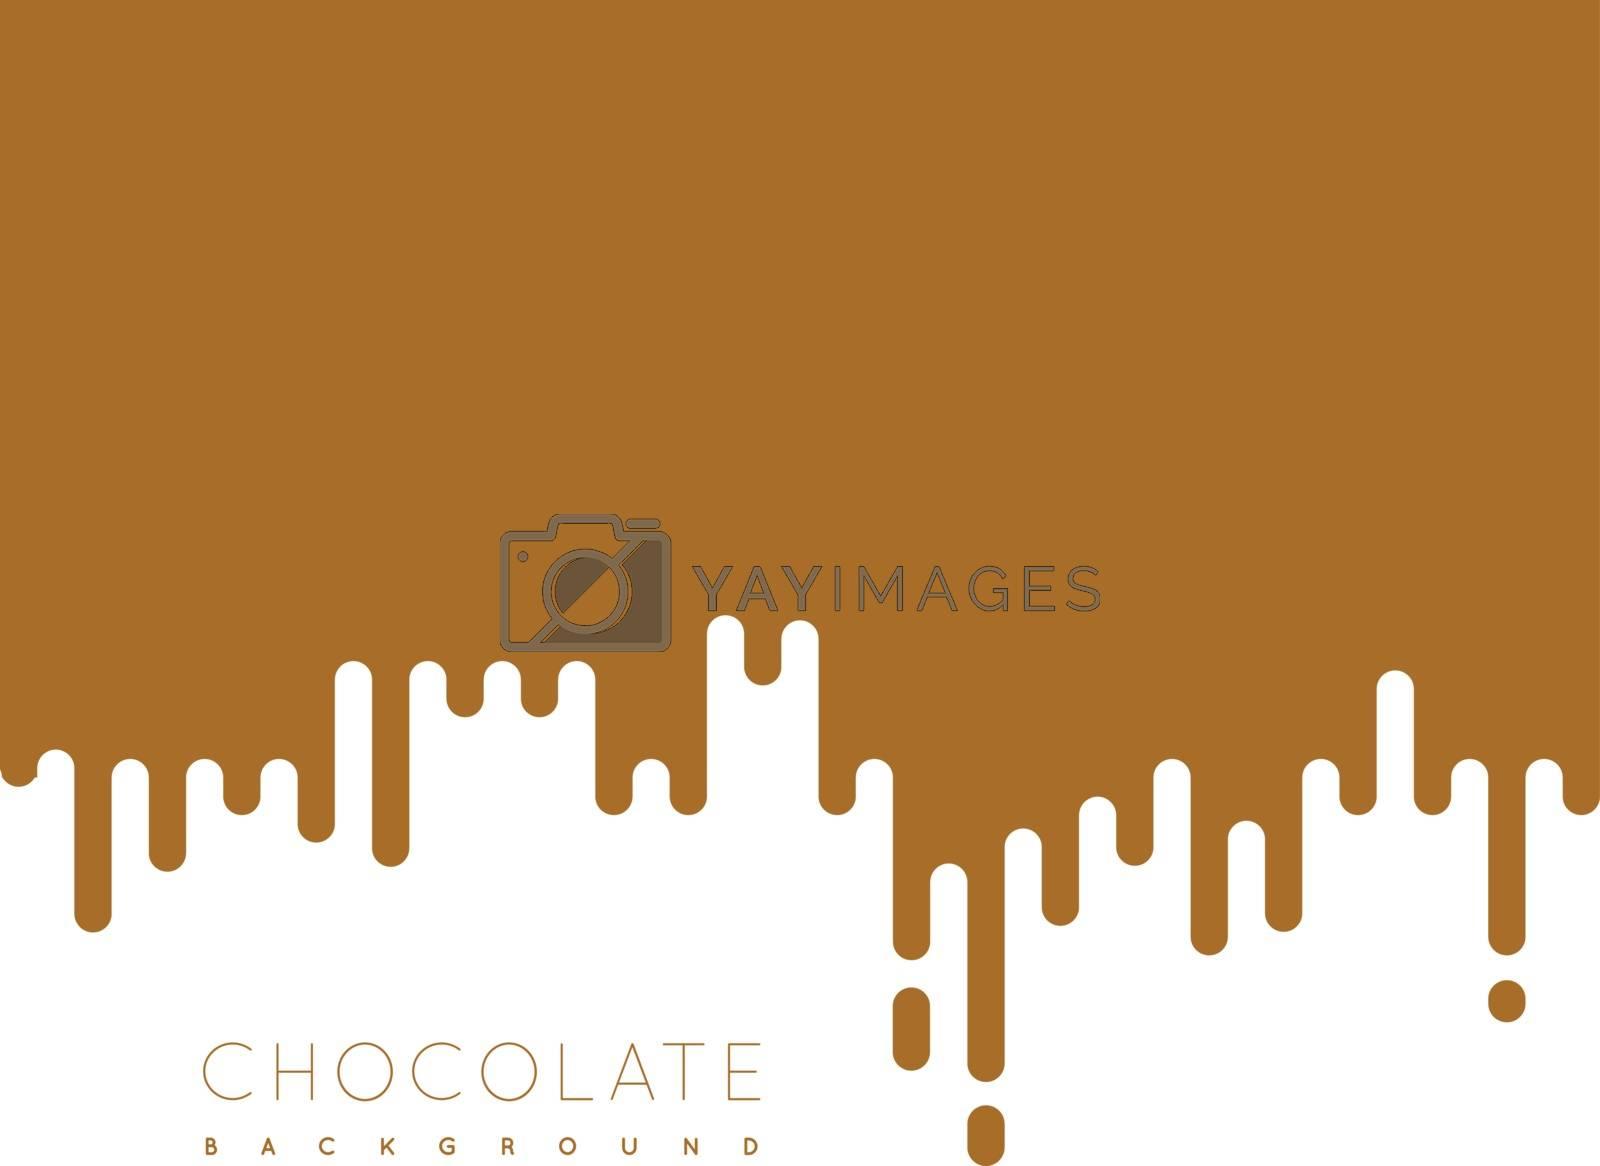 Chocolate irregular rounded lines background. Vector illustraion